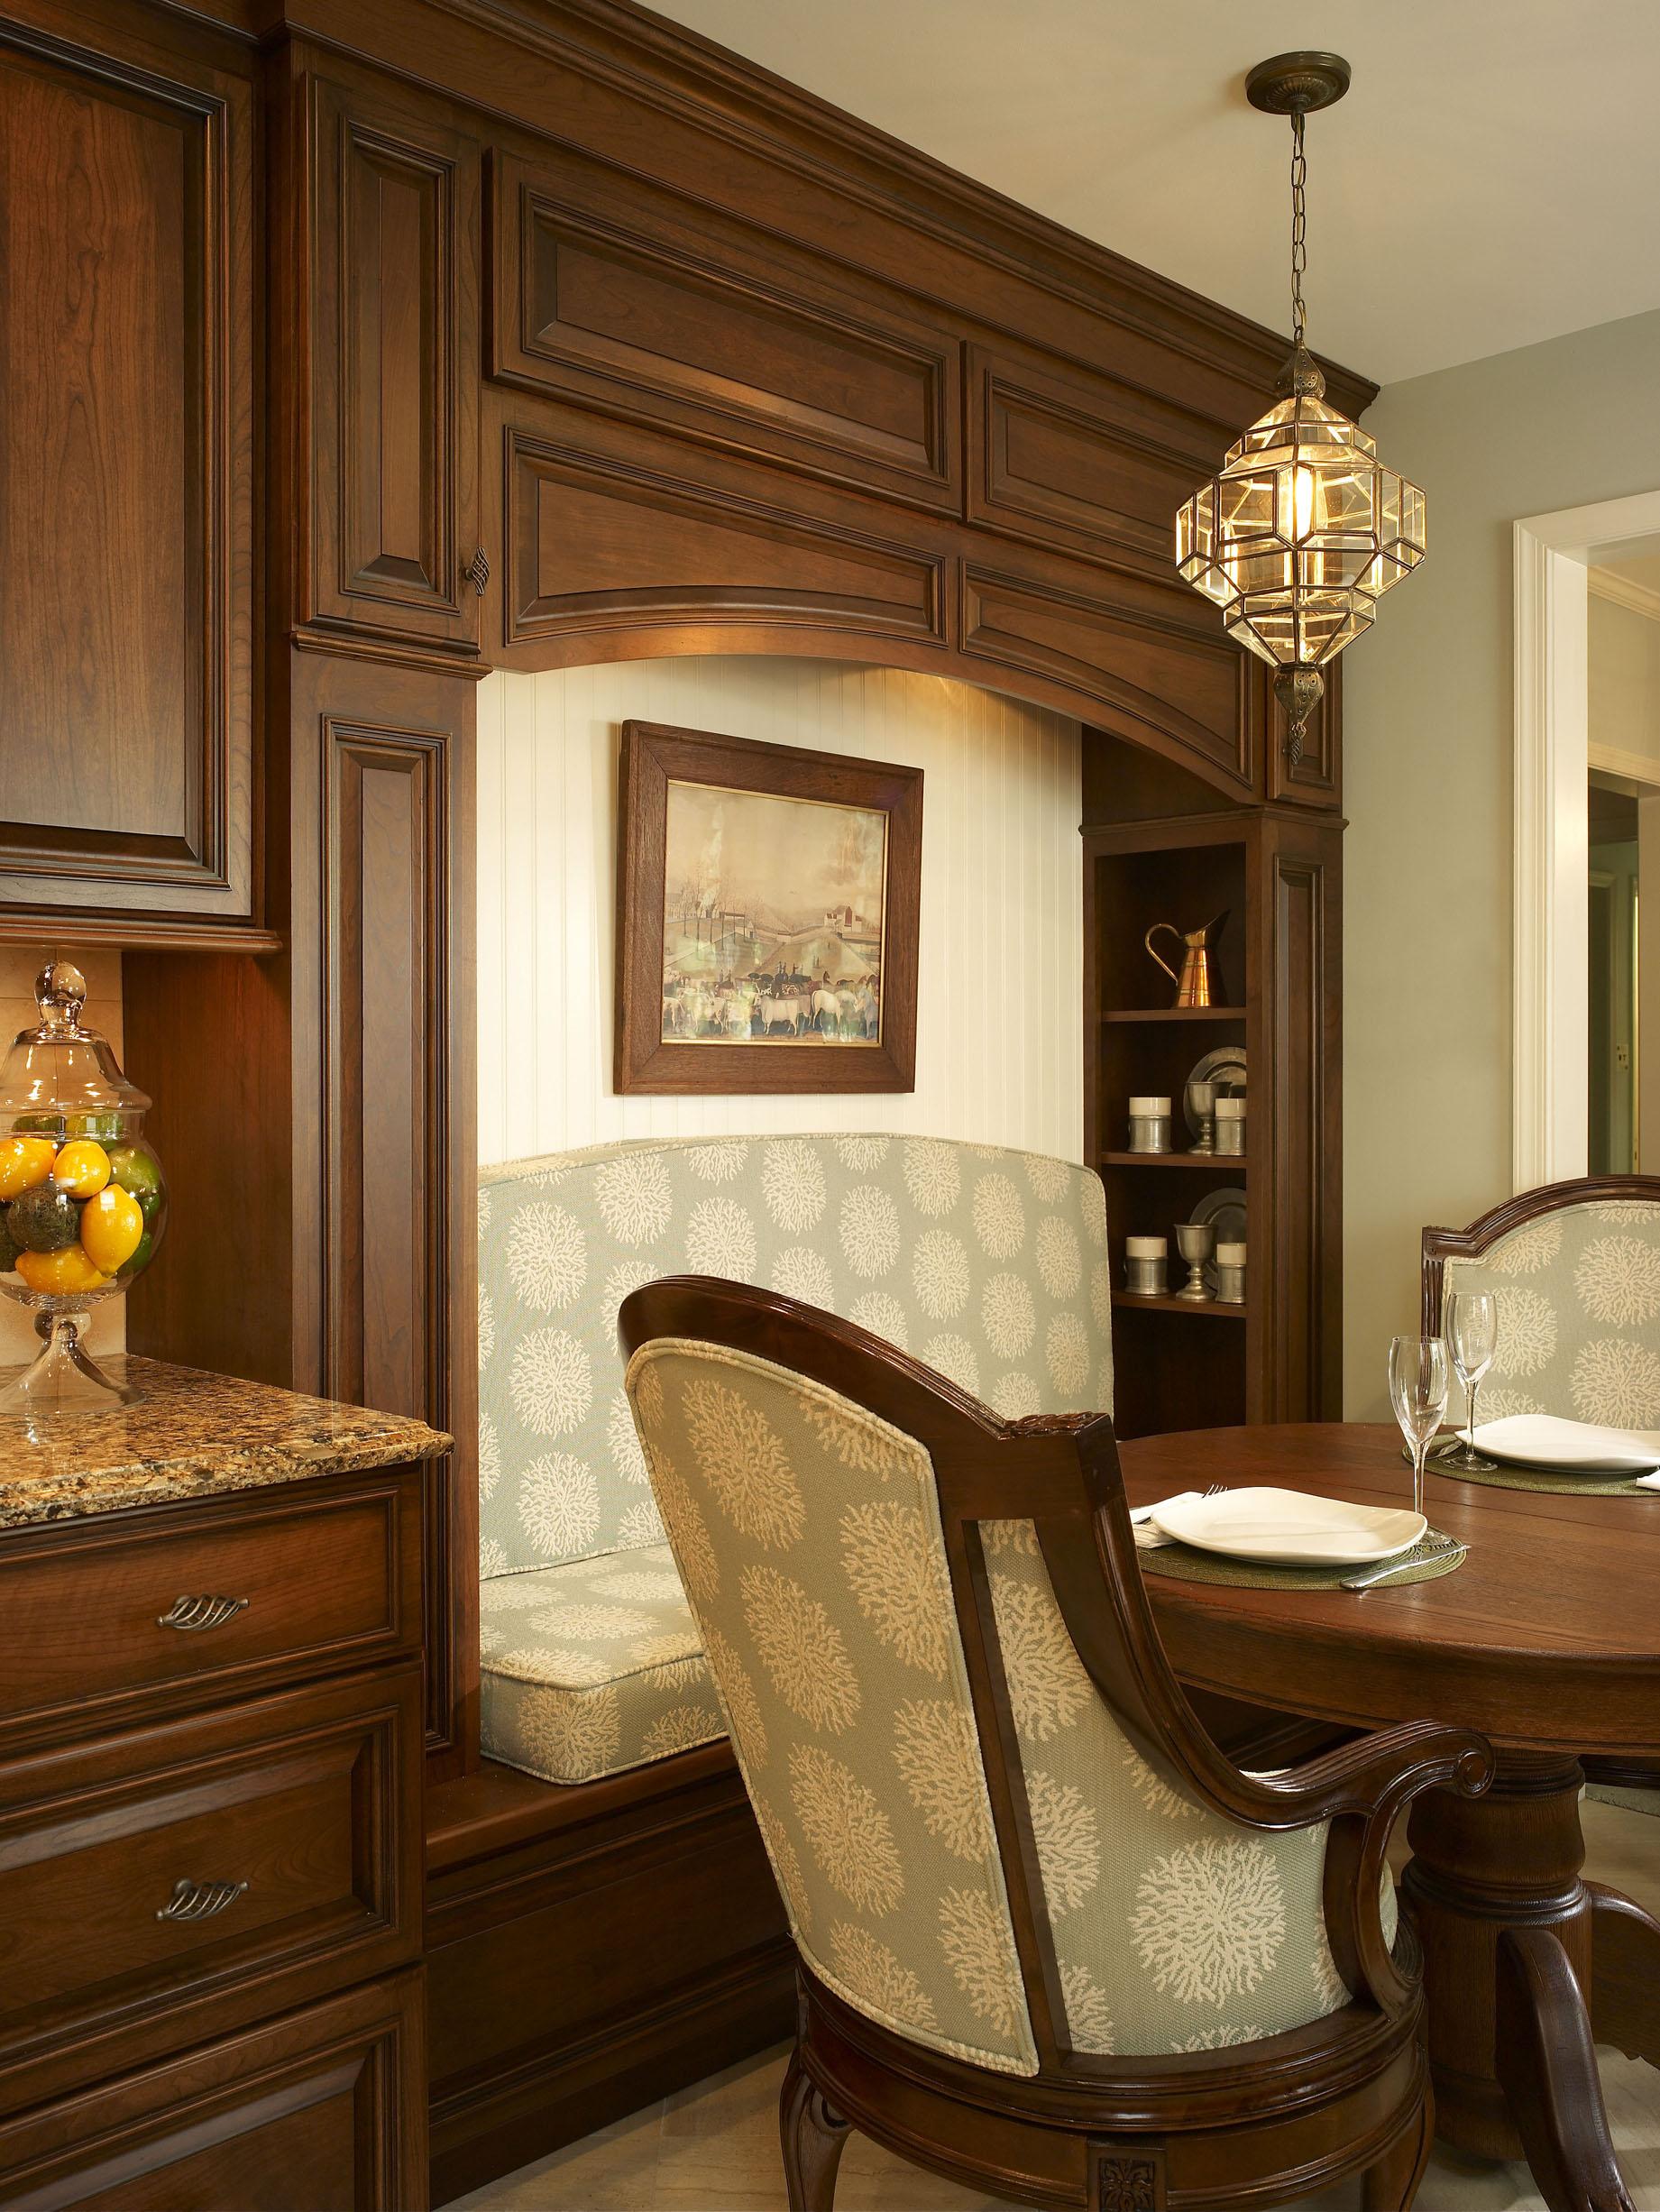 Custom designed eat-in nook with hidden storage in cabinet panels.